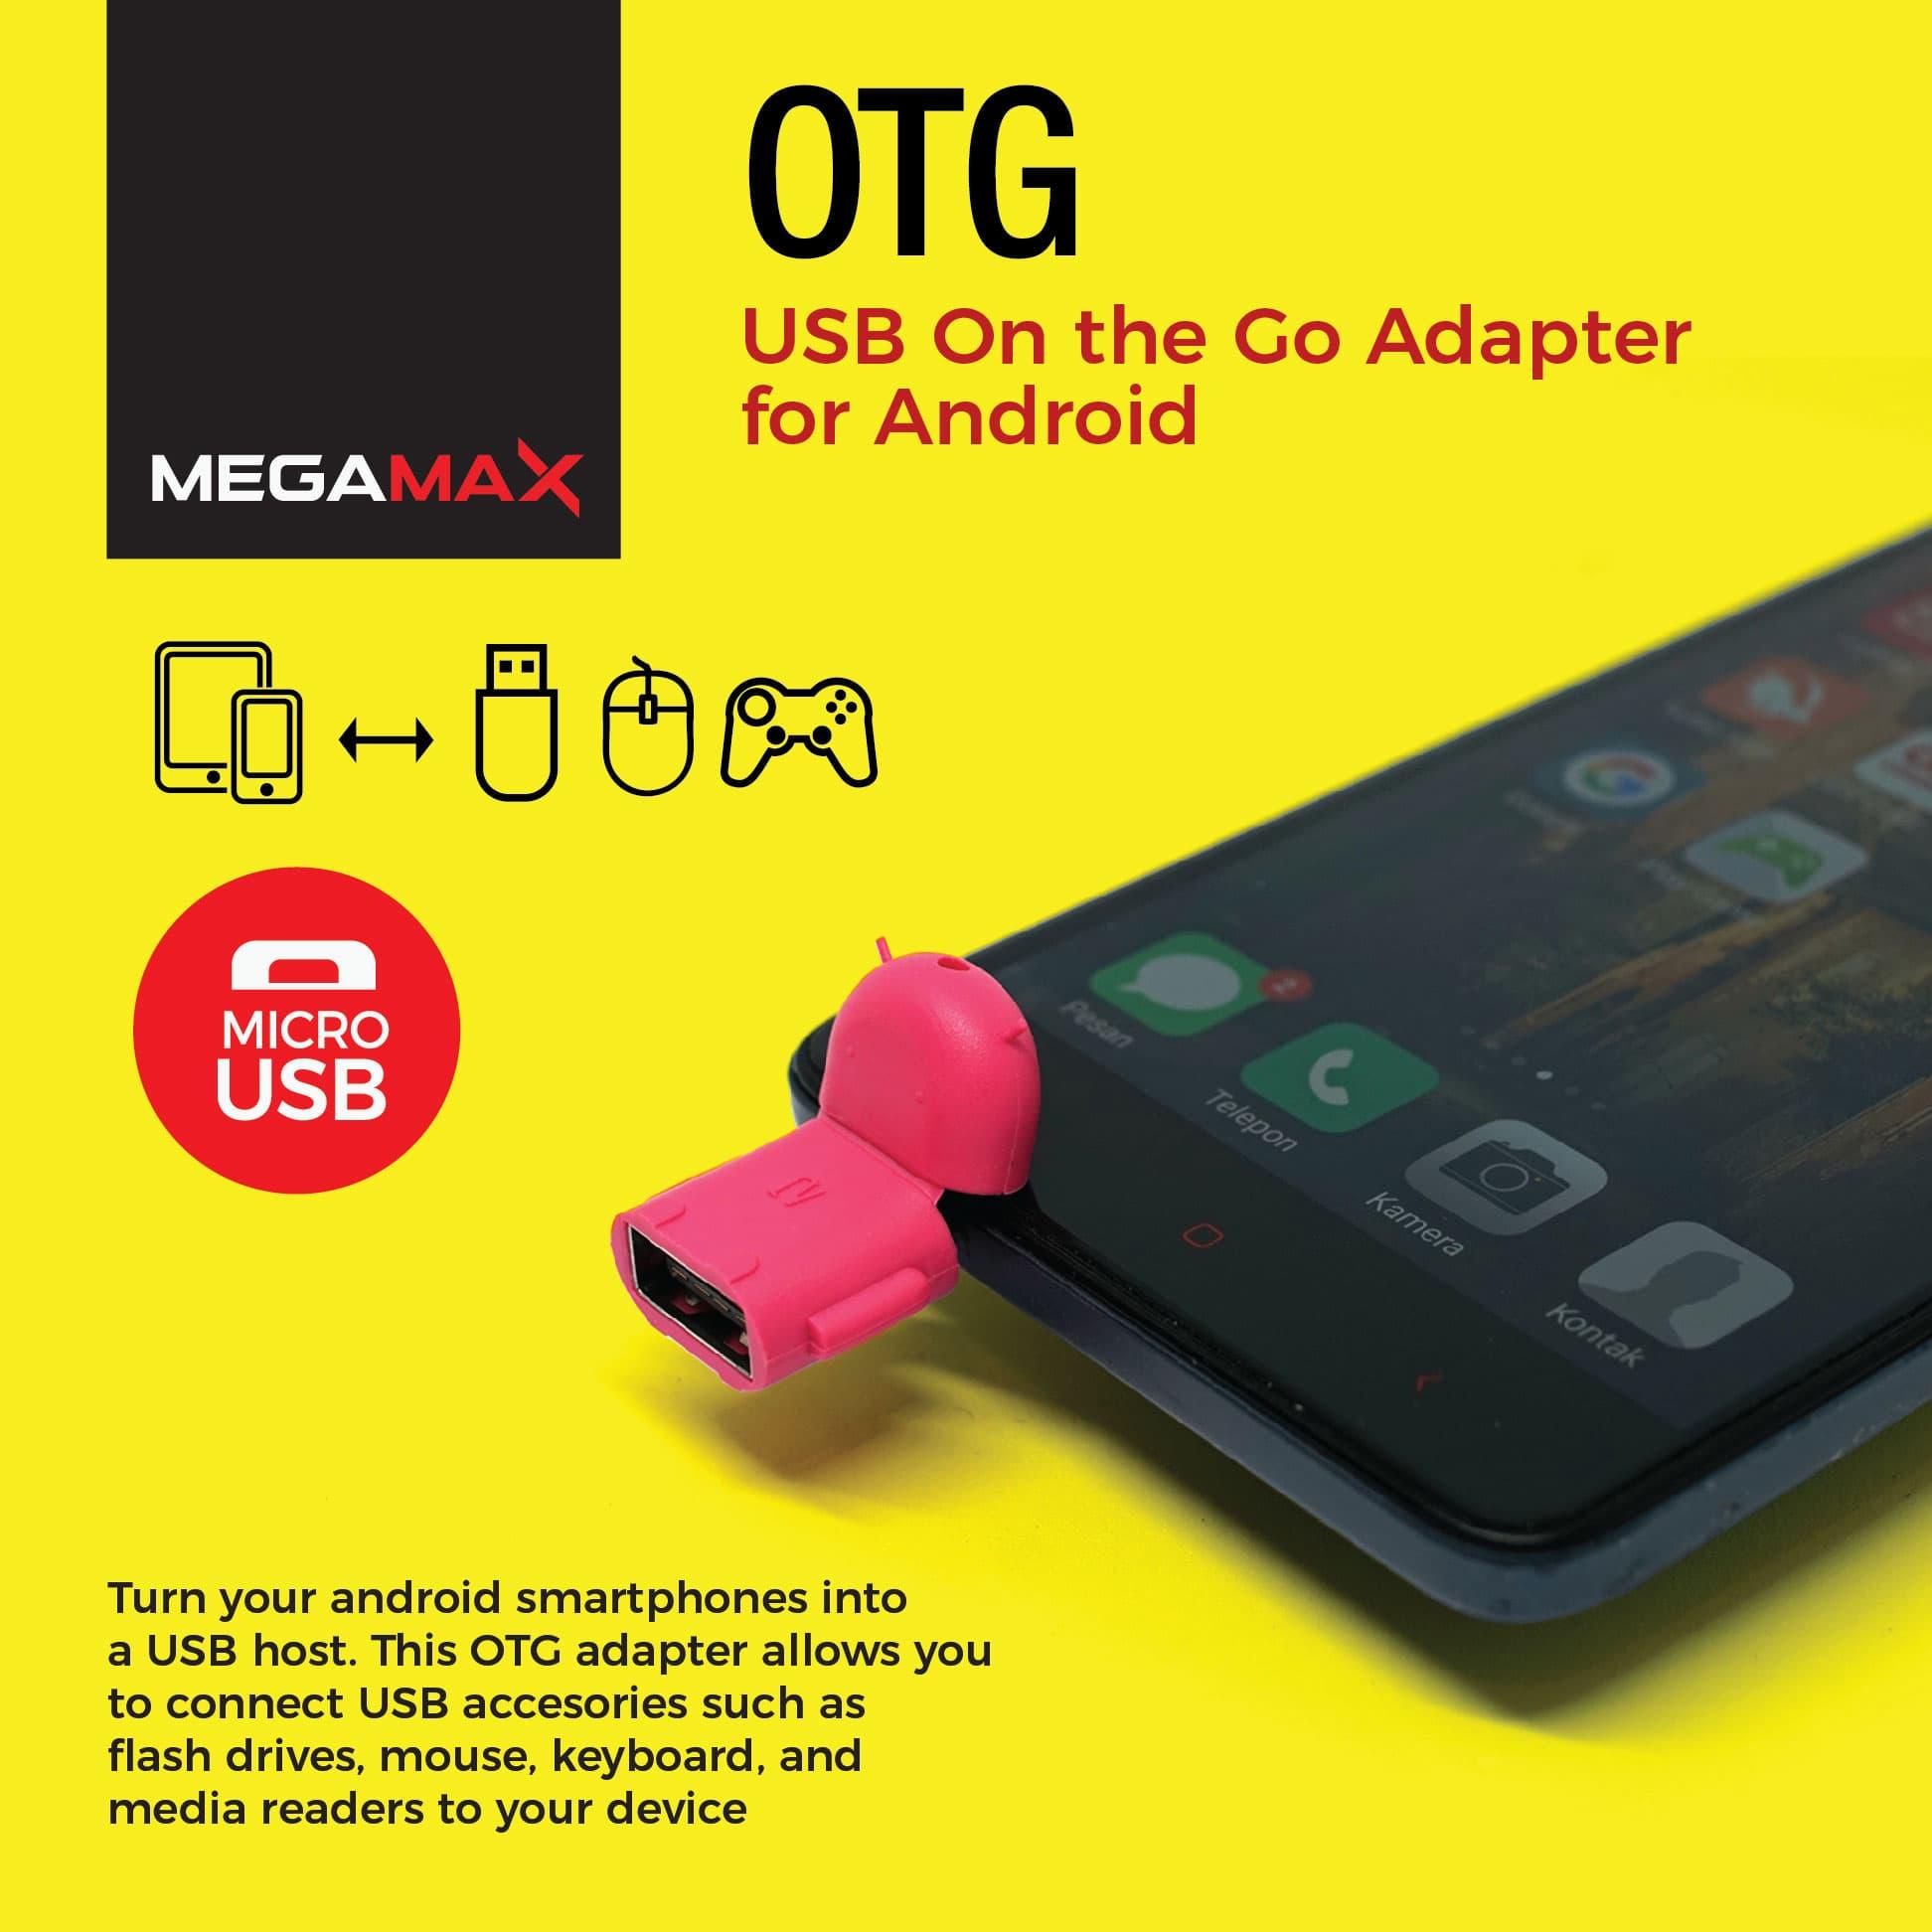 OTG USB Adapter Android Merah Muda OTG Drives DKI Jakarta Source · 38491627 d536c03b 2dbe 45d9 be34 ce69e41499ae 1944 1944 jpg